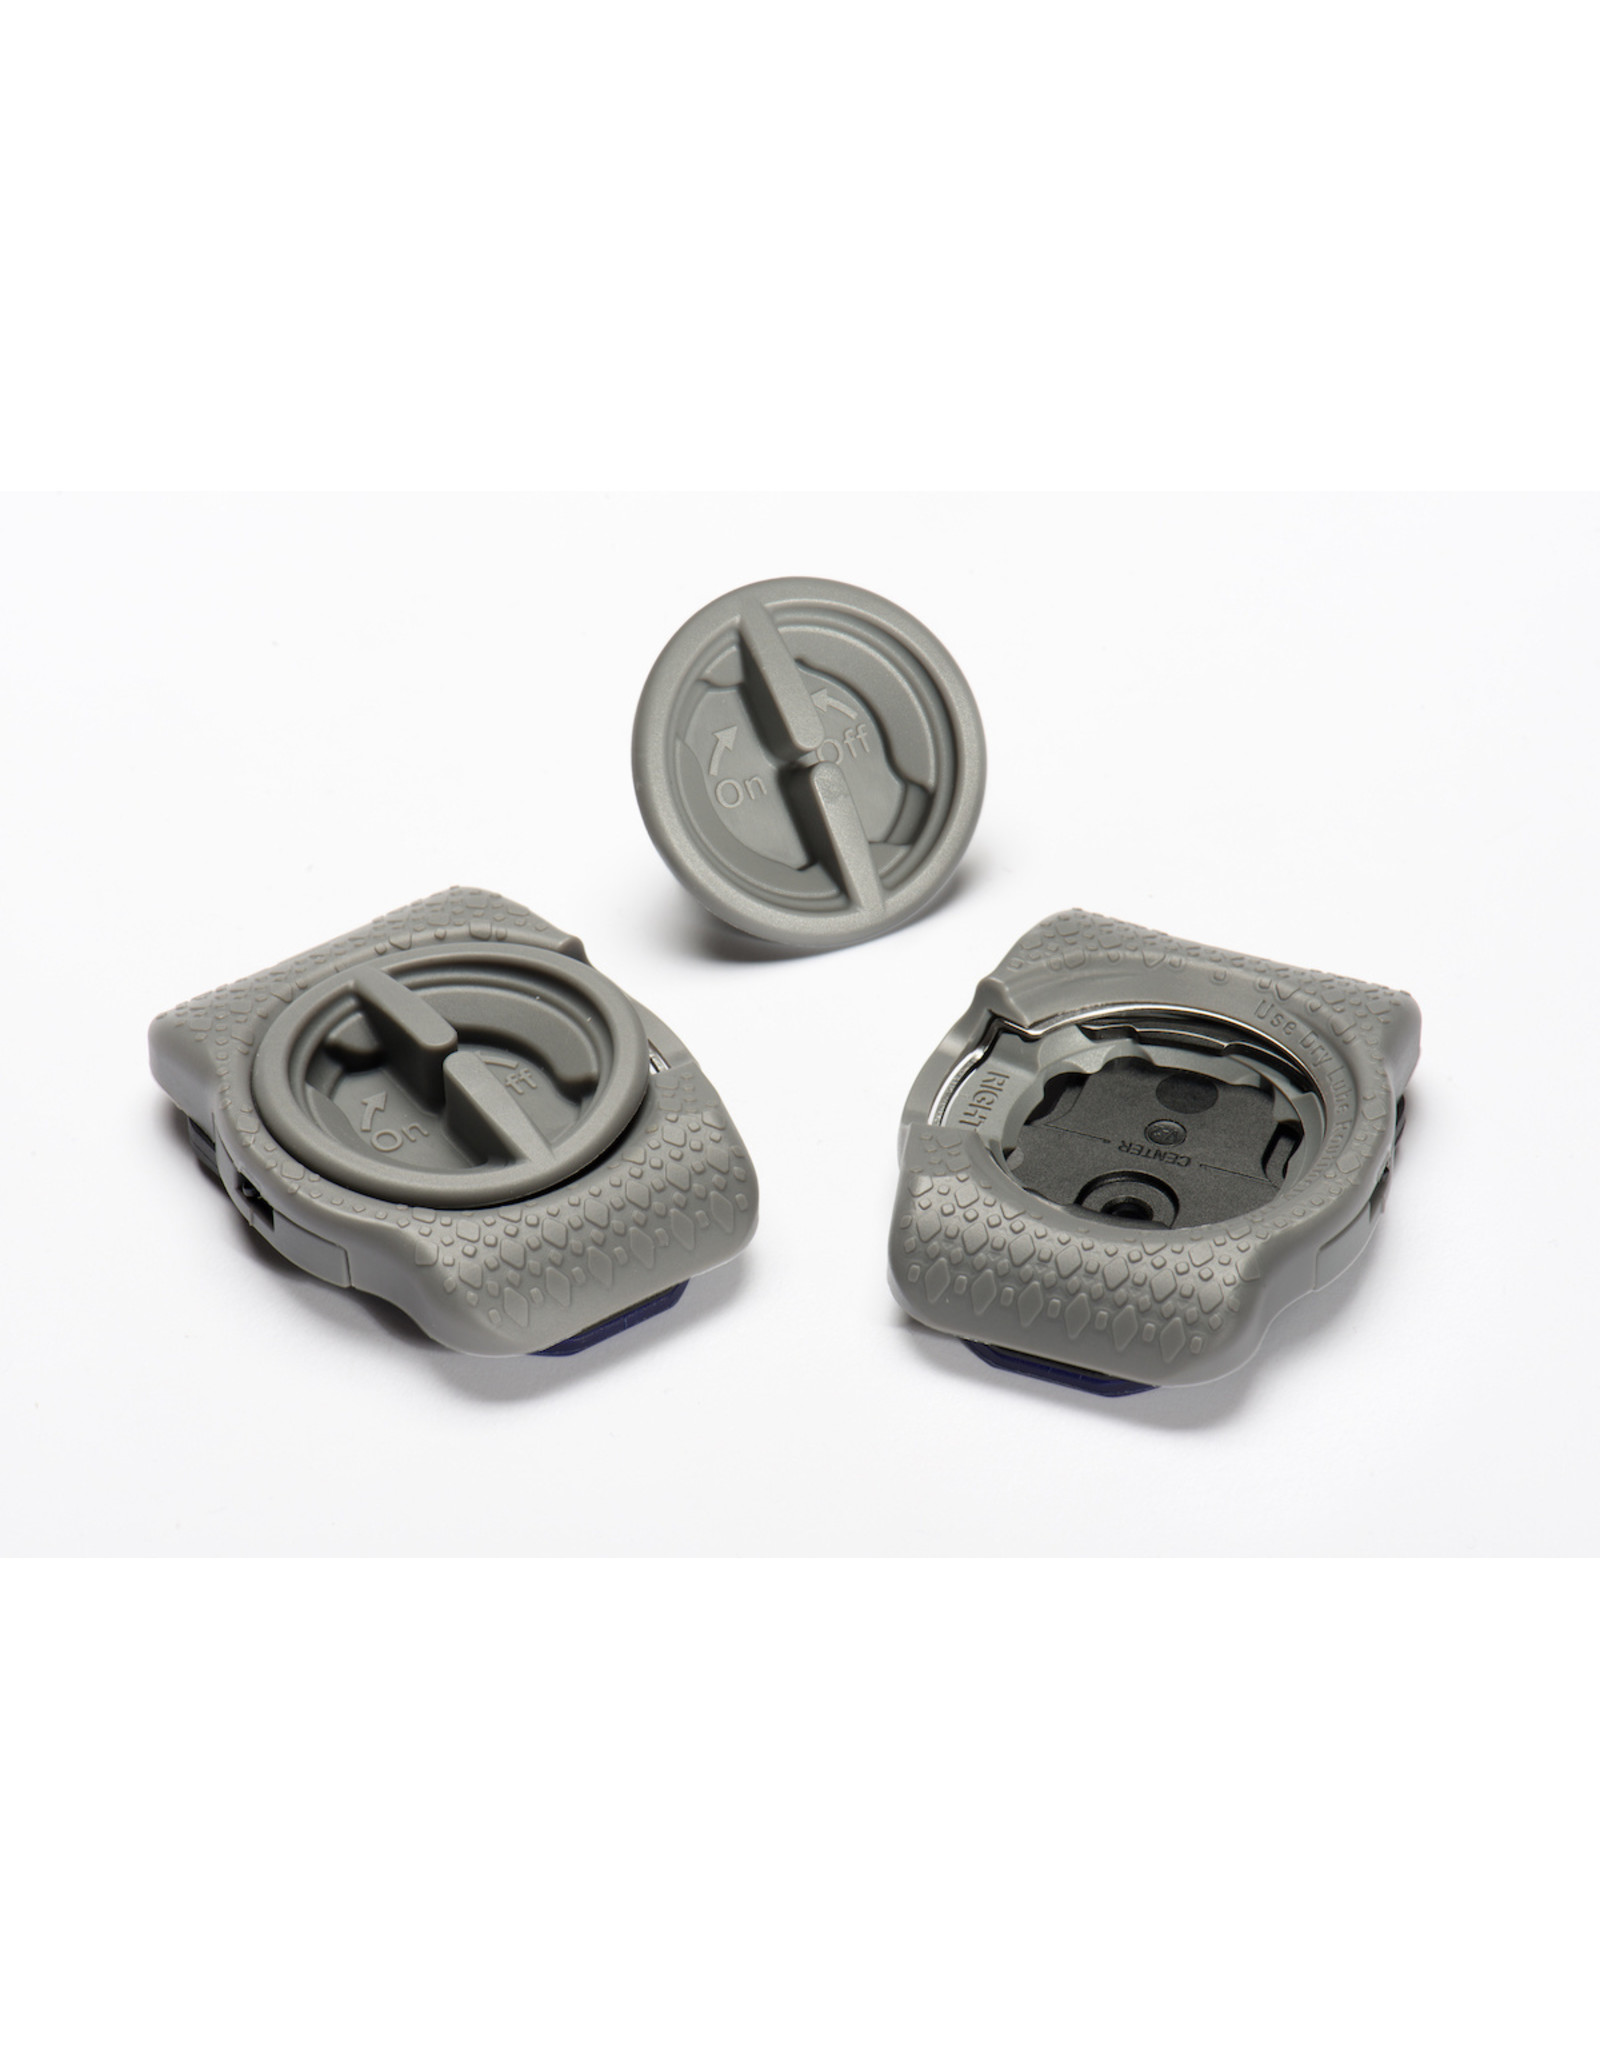 Speedplay Speedplay Ultra Light Action Walkable Cleat - Grey